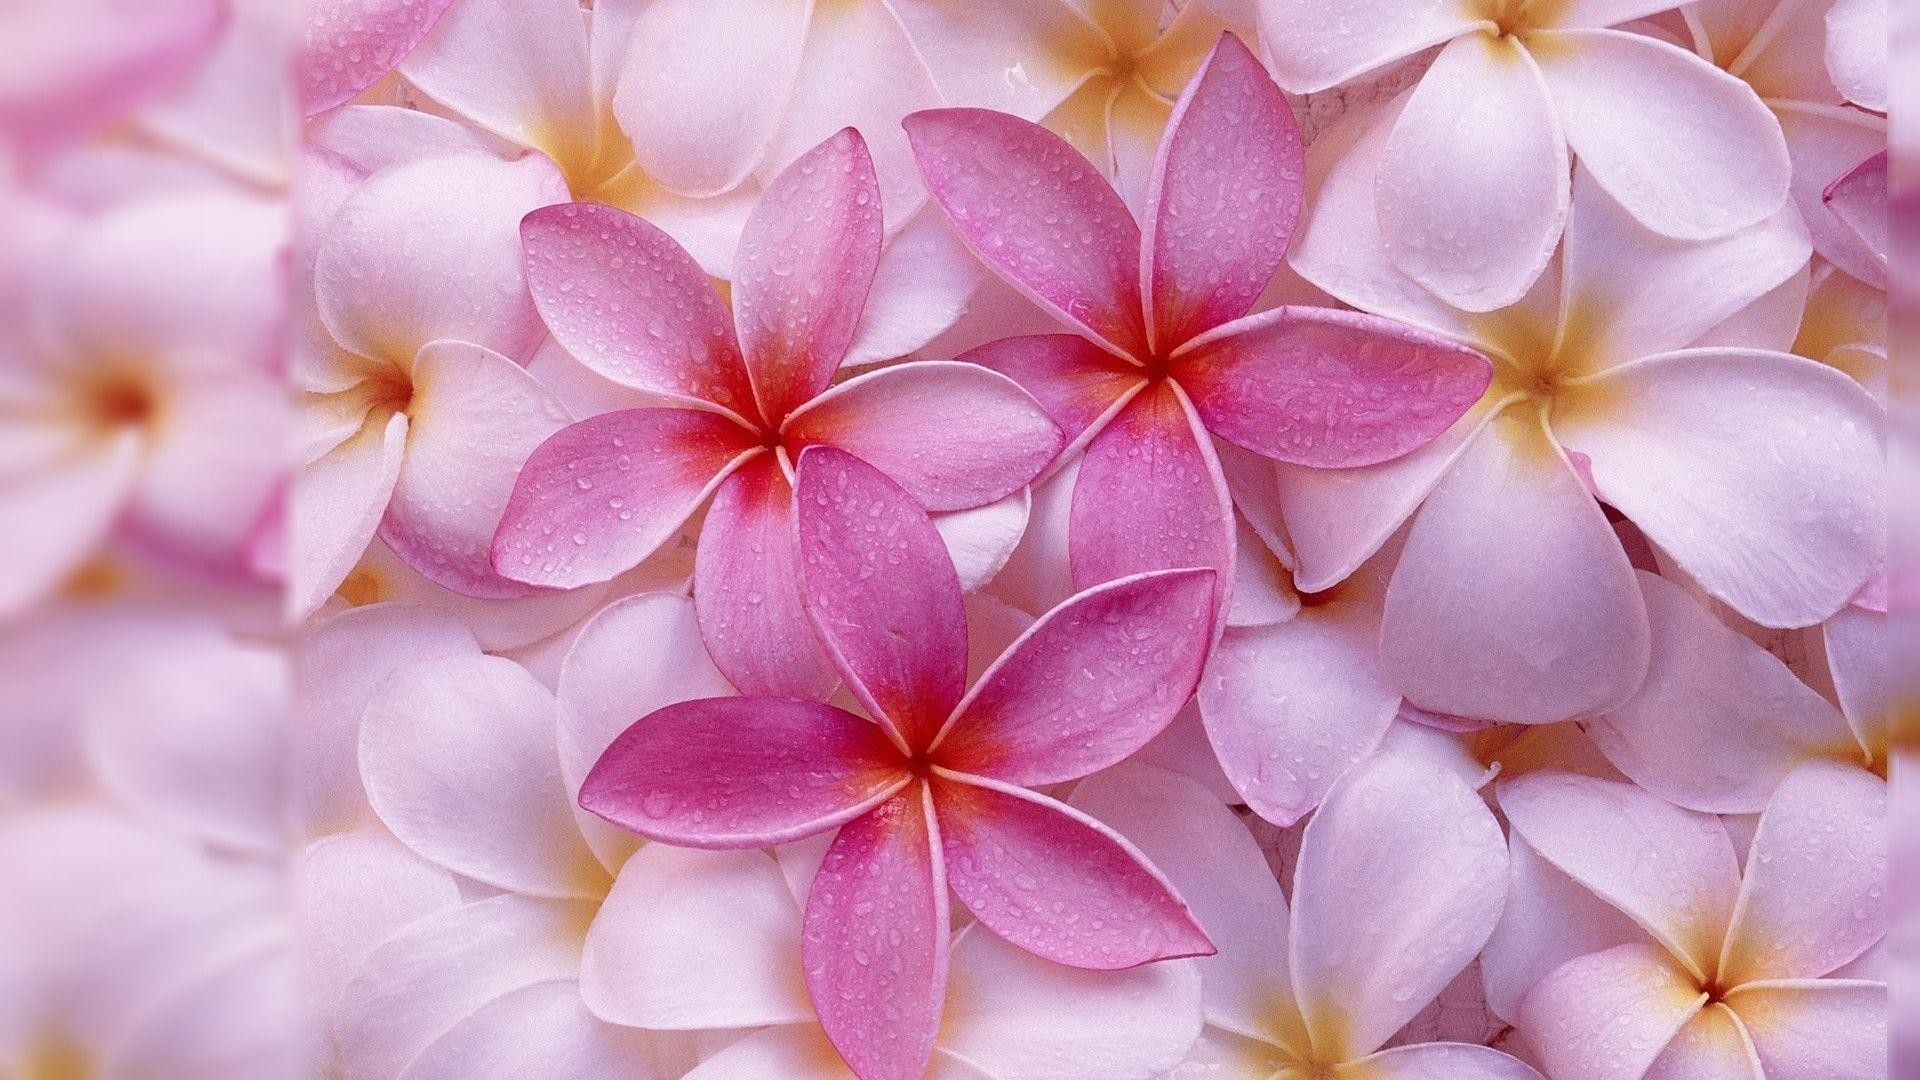 Flowers Images Desktop Backgrounds